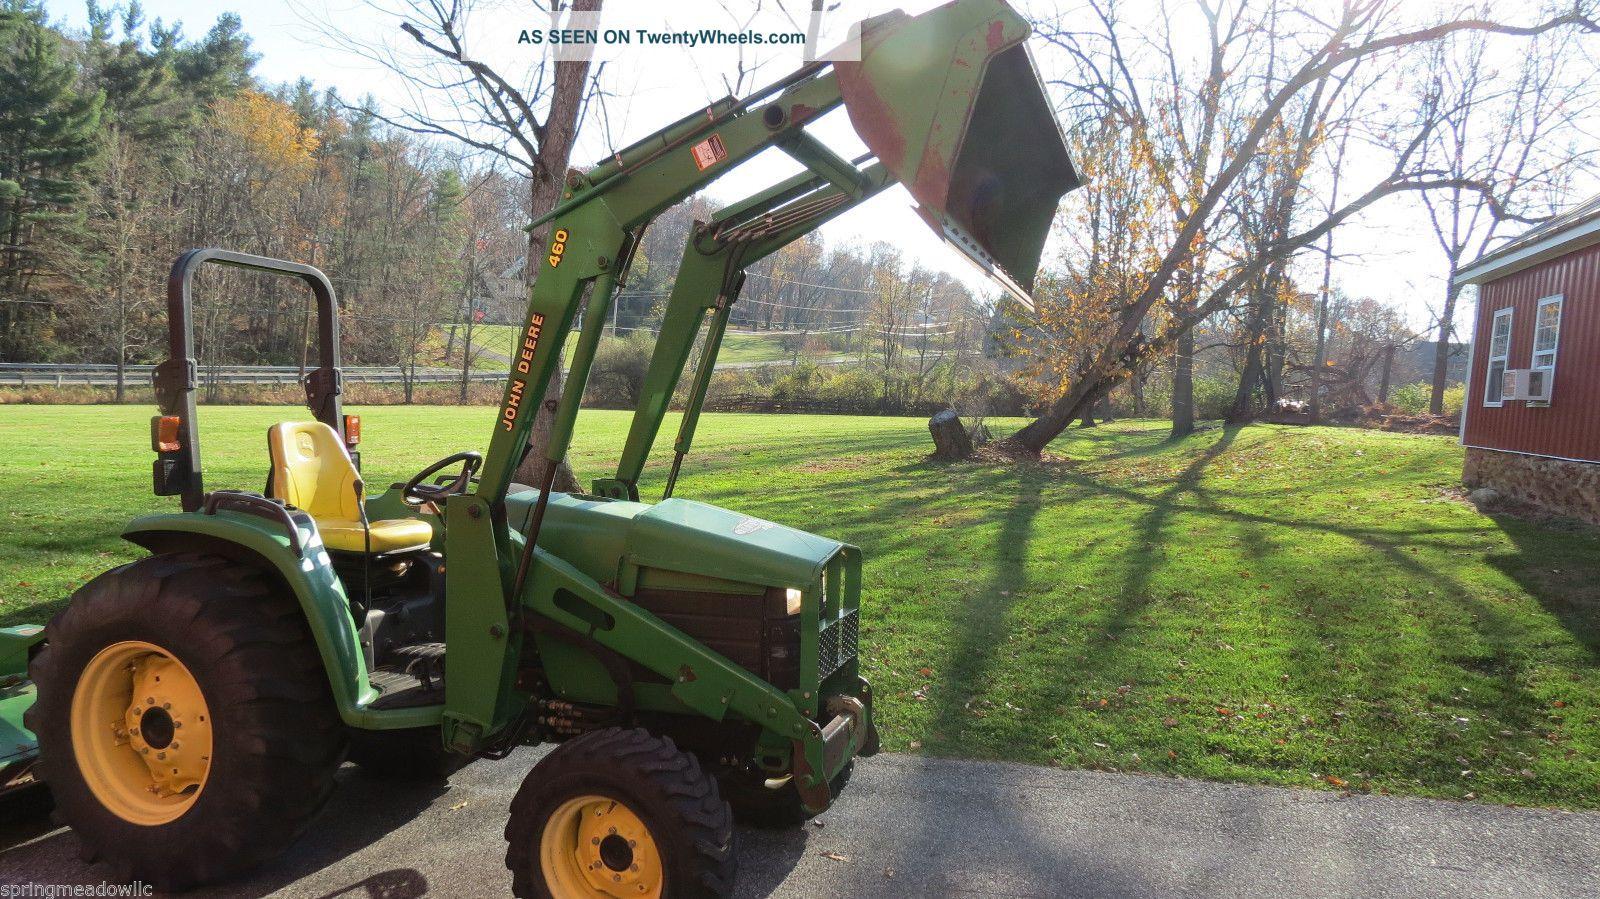 2003 John Deere 4610 4x4 Compact Tractor W/ Loader Hydrostatic 43 Hp ...